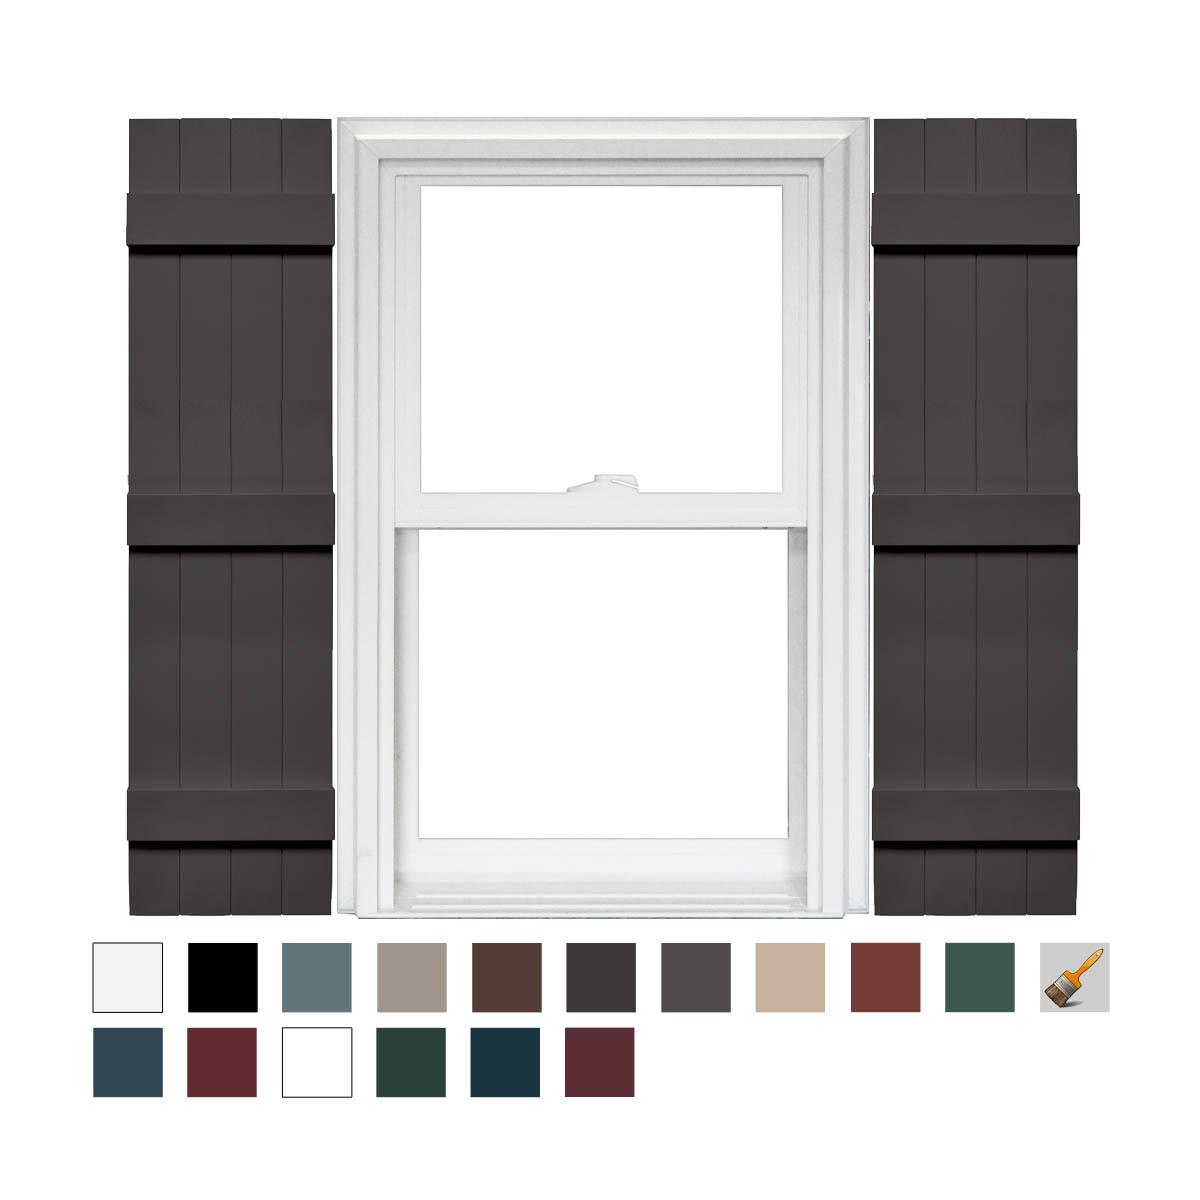 14 x 55 018 Tuxedo Gray